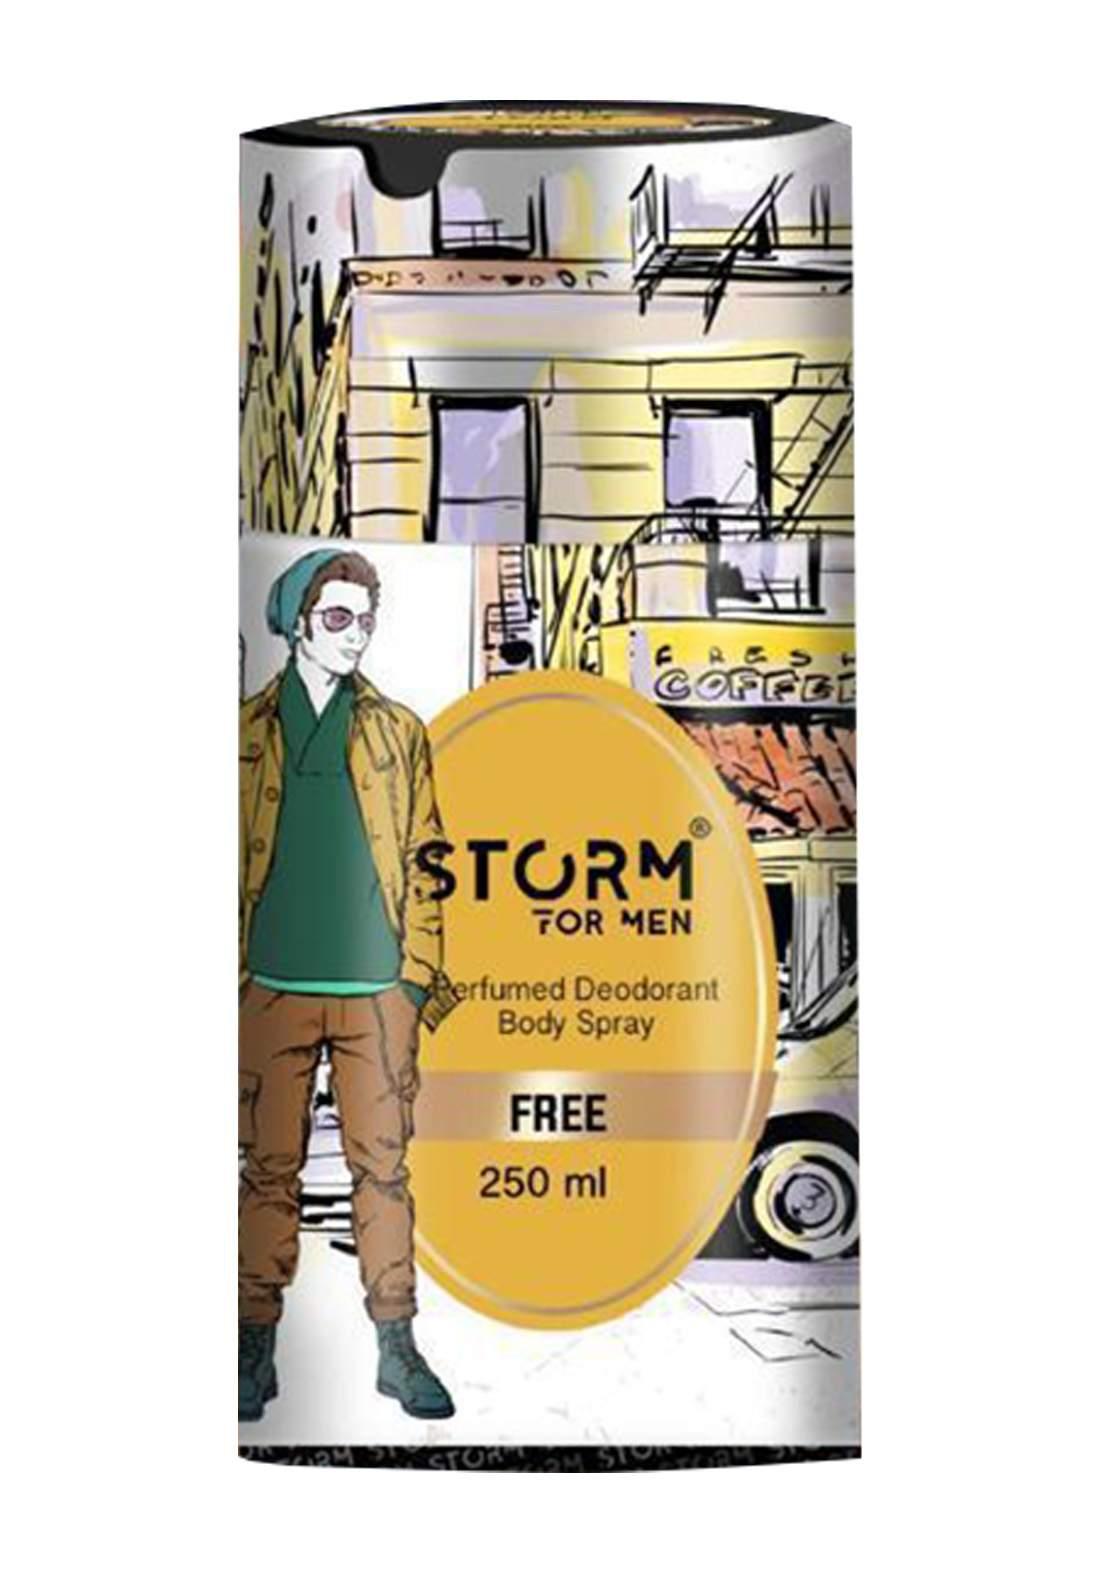 Storm Perfumed Deodorant Body Spray For Men-Free 250ml معطر جسم رجالي